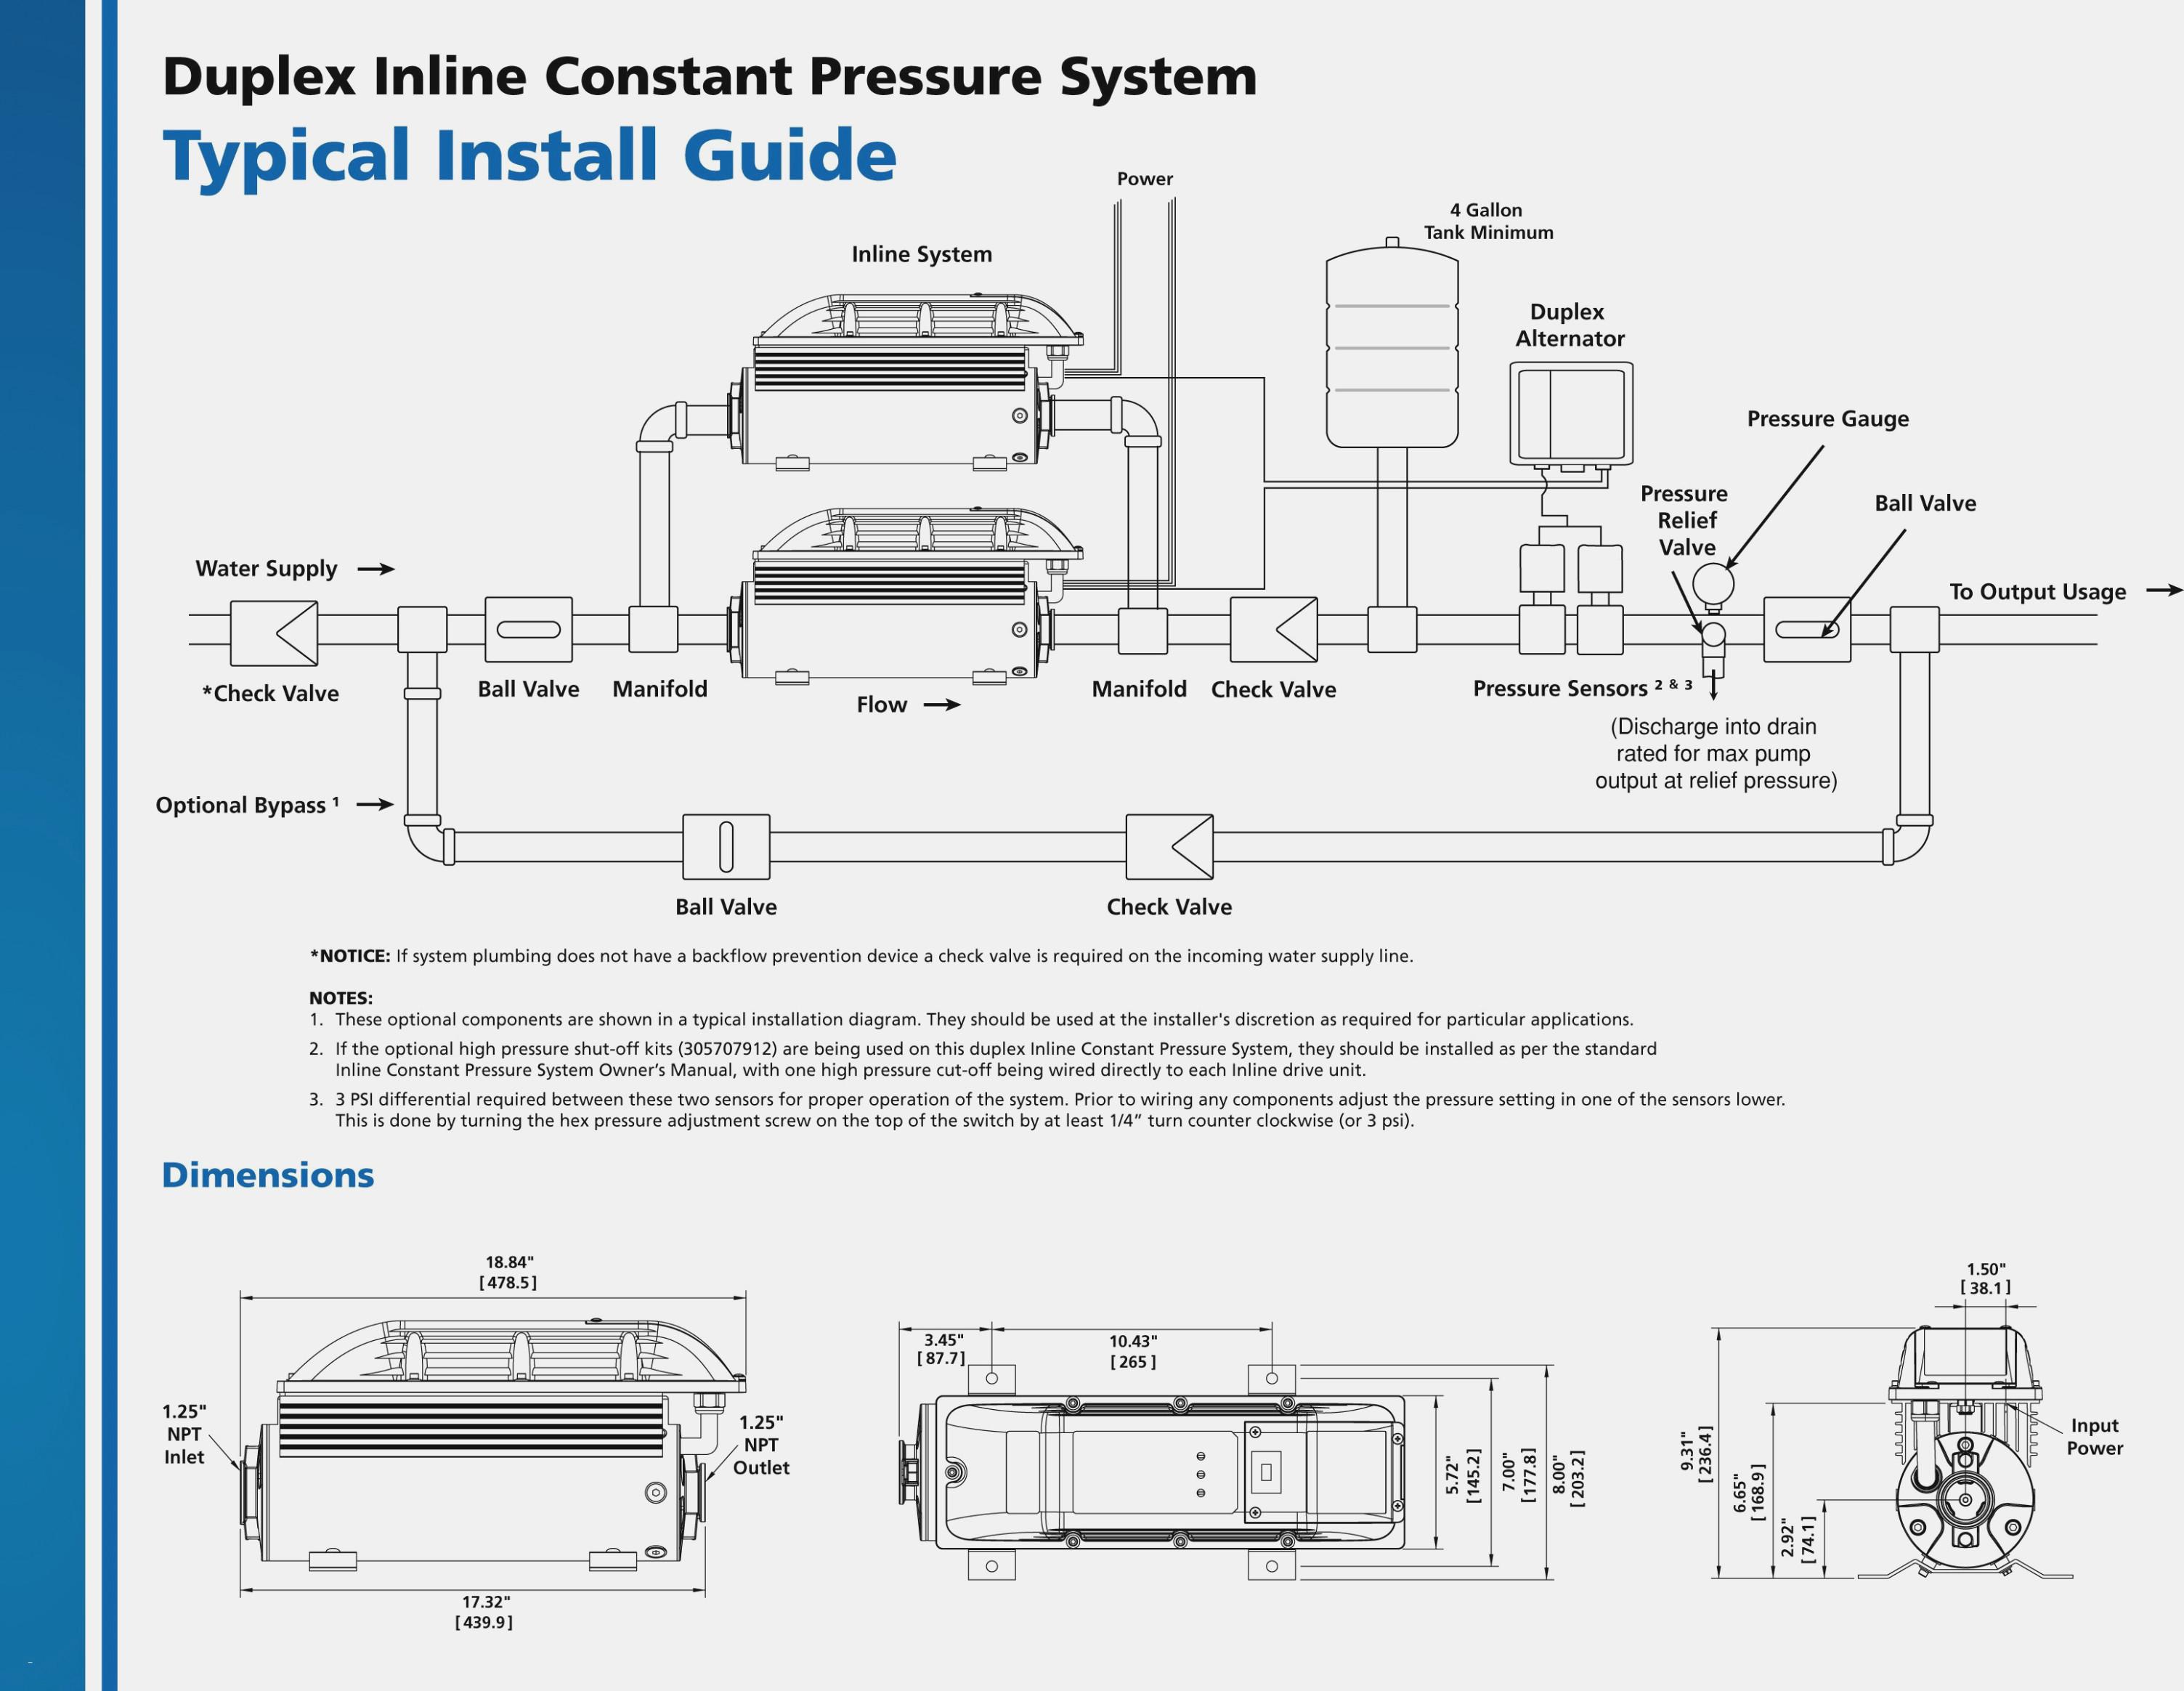 Wiring Diagram For 220 Volt Air Compressor | Wiring Diagram - 220 Volt Air Compressor Wiring Diagram